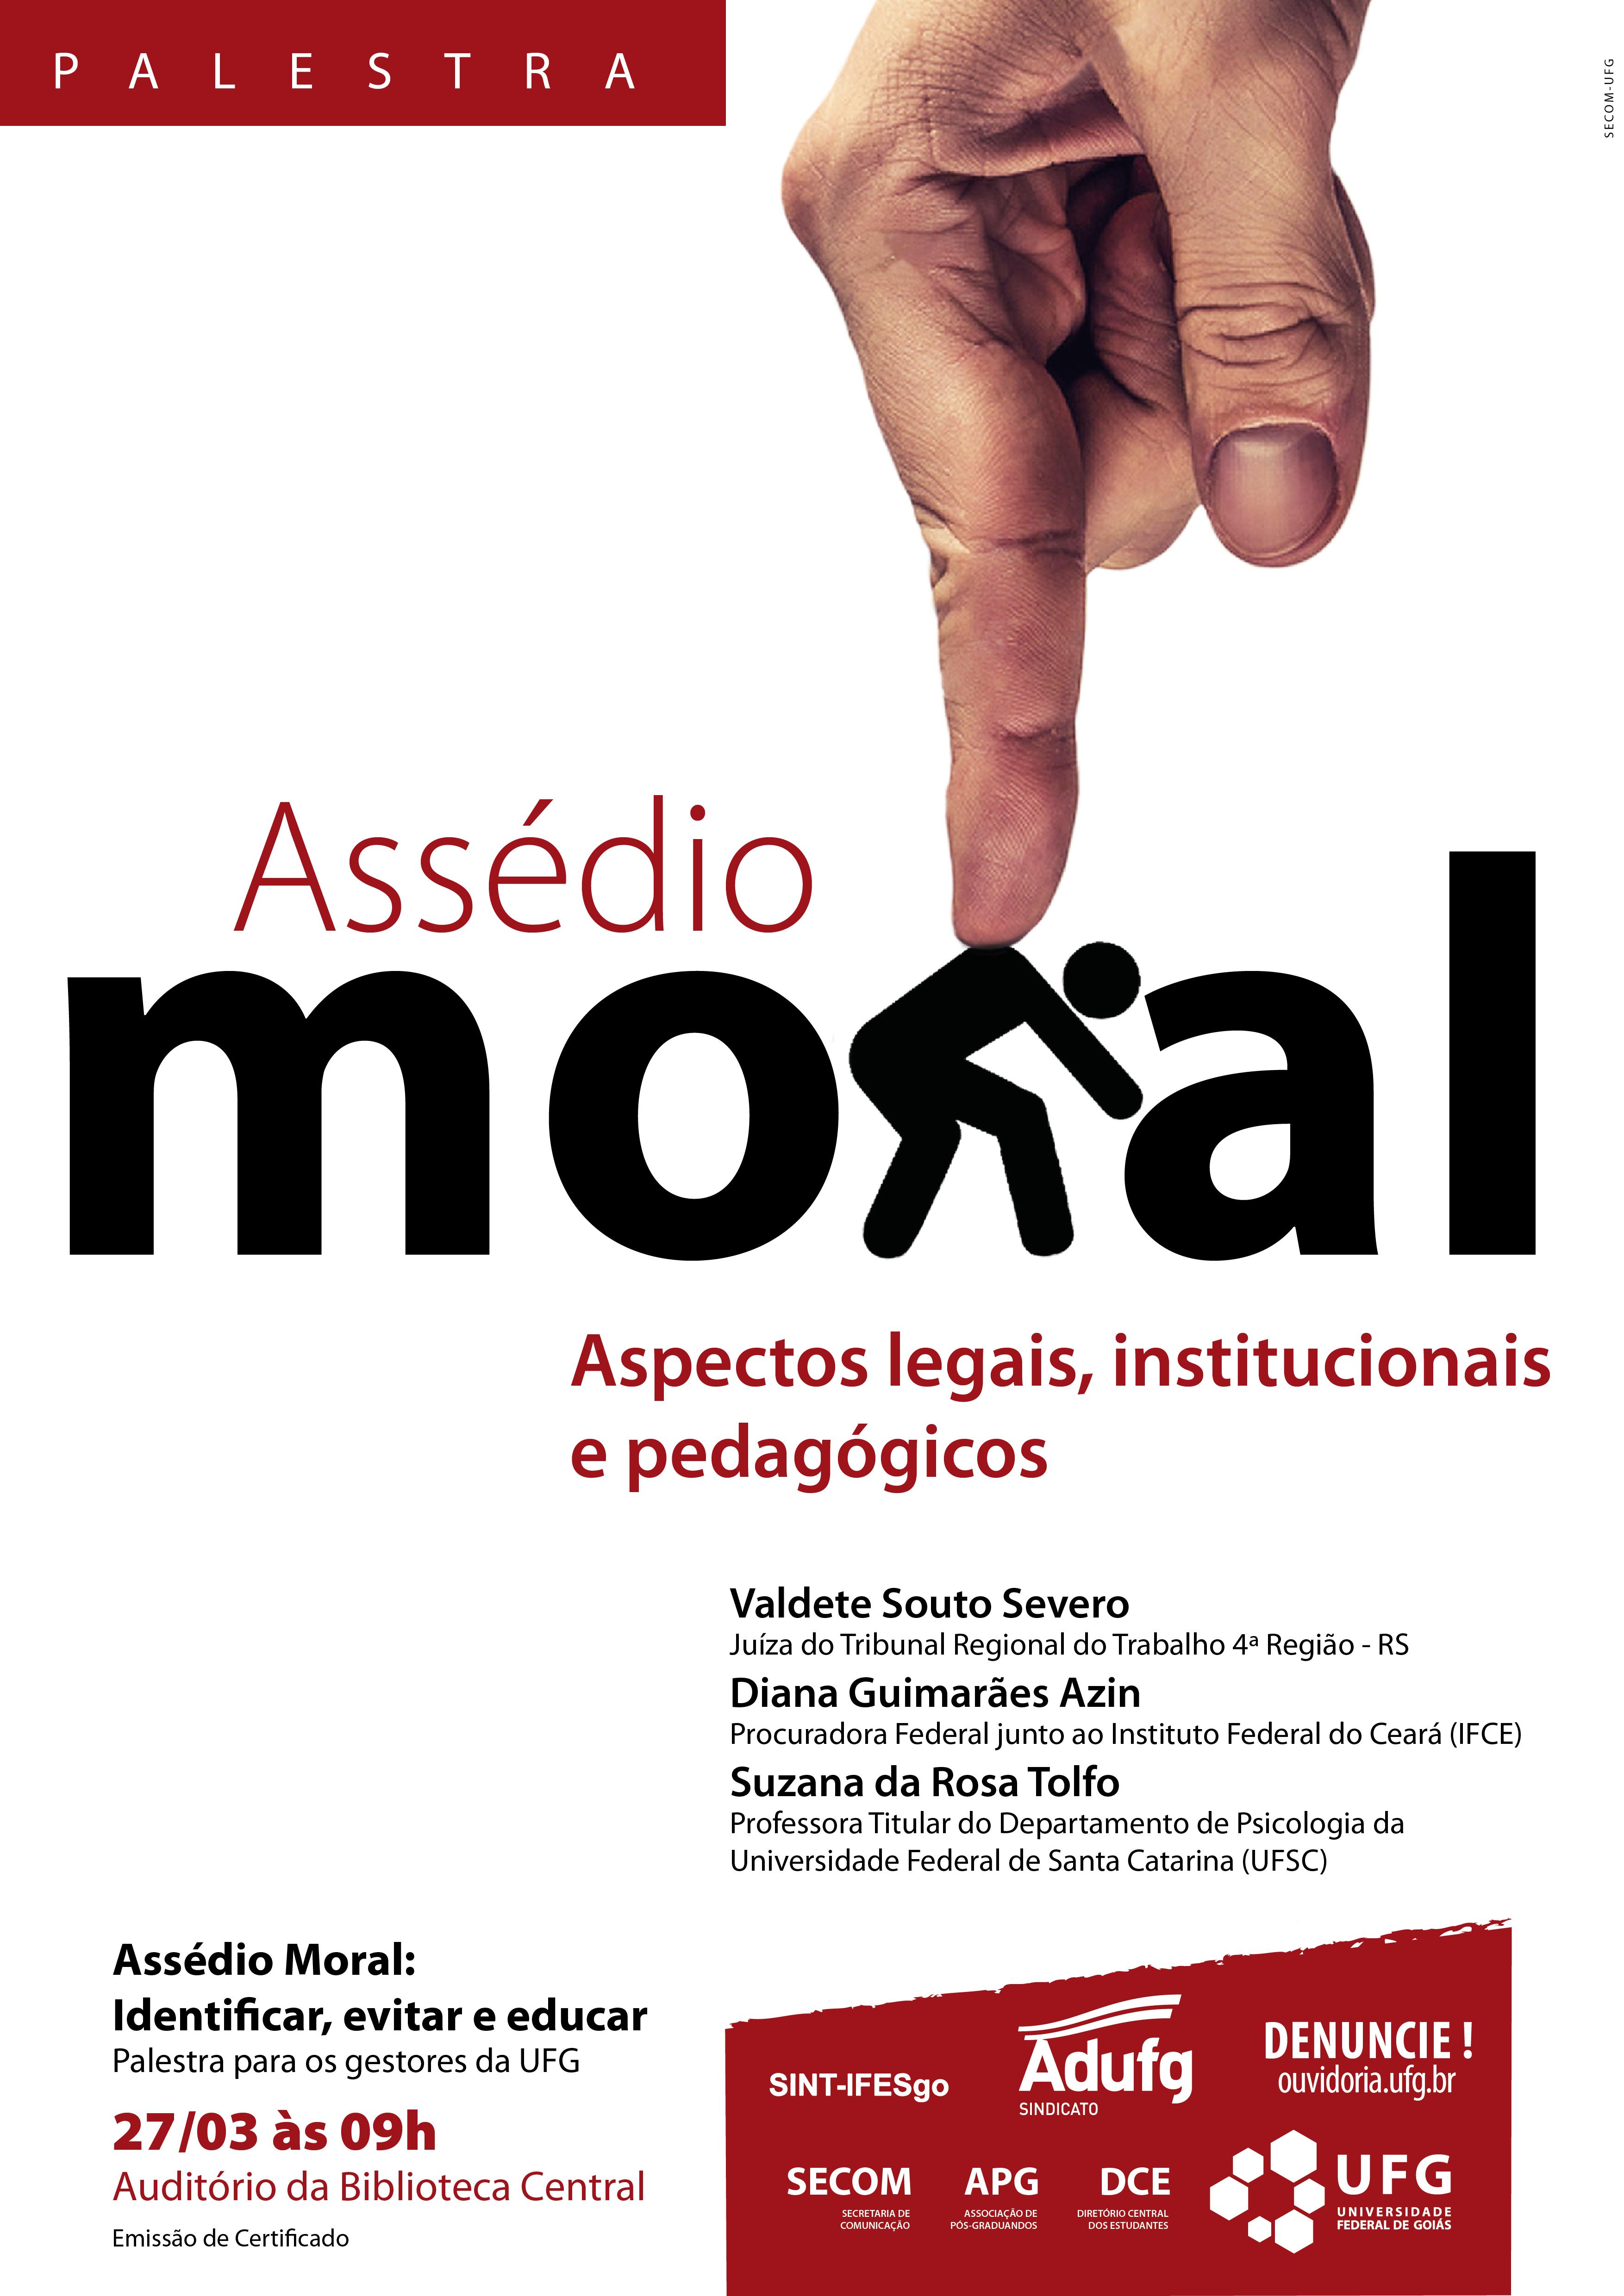 palestra_ASSEDIO_MORAL_2019-MATUTINO-01.png